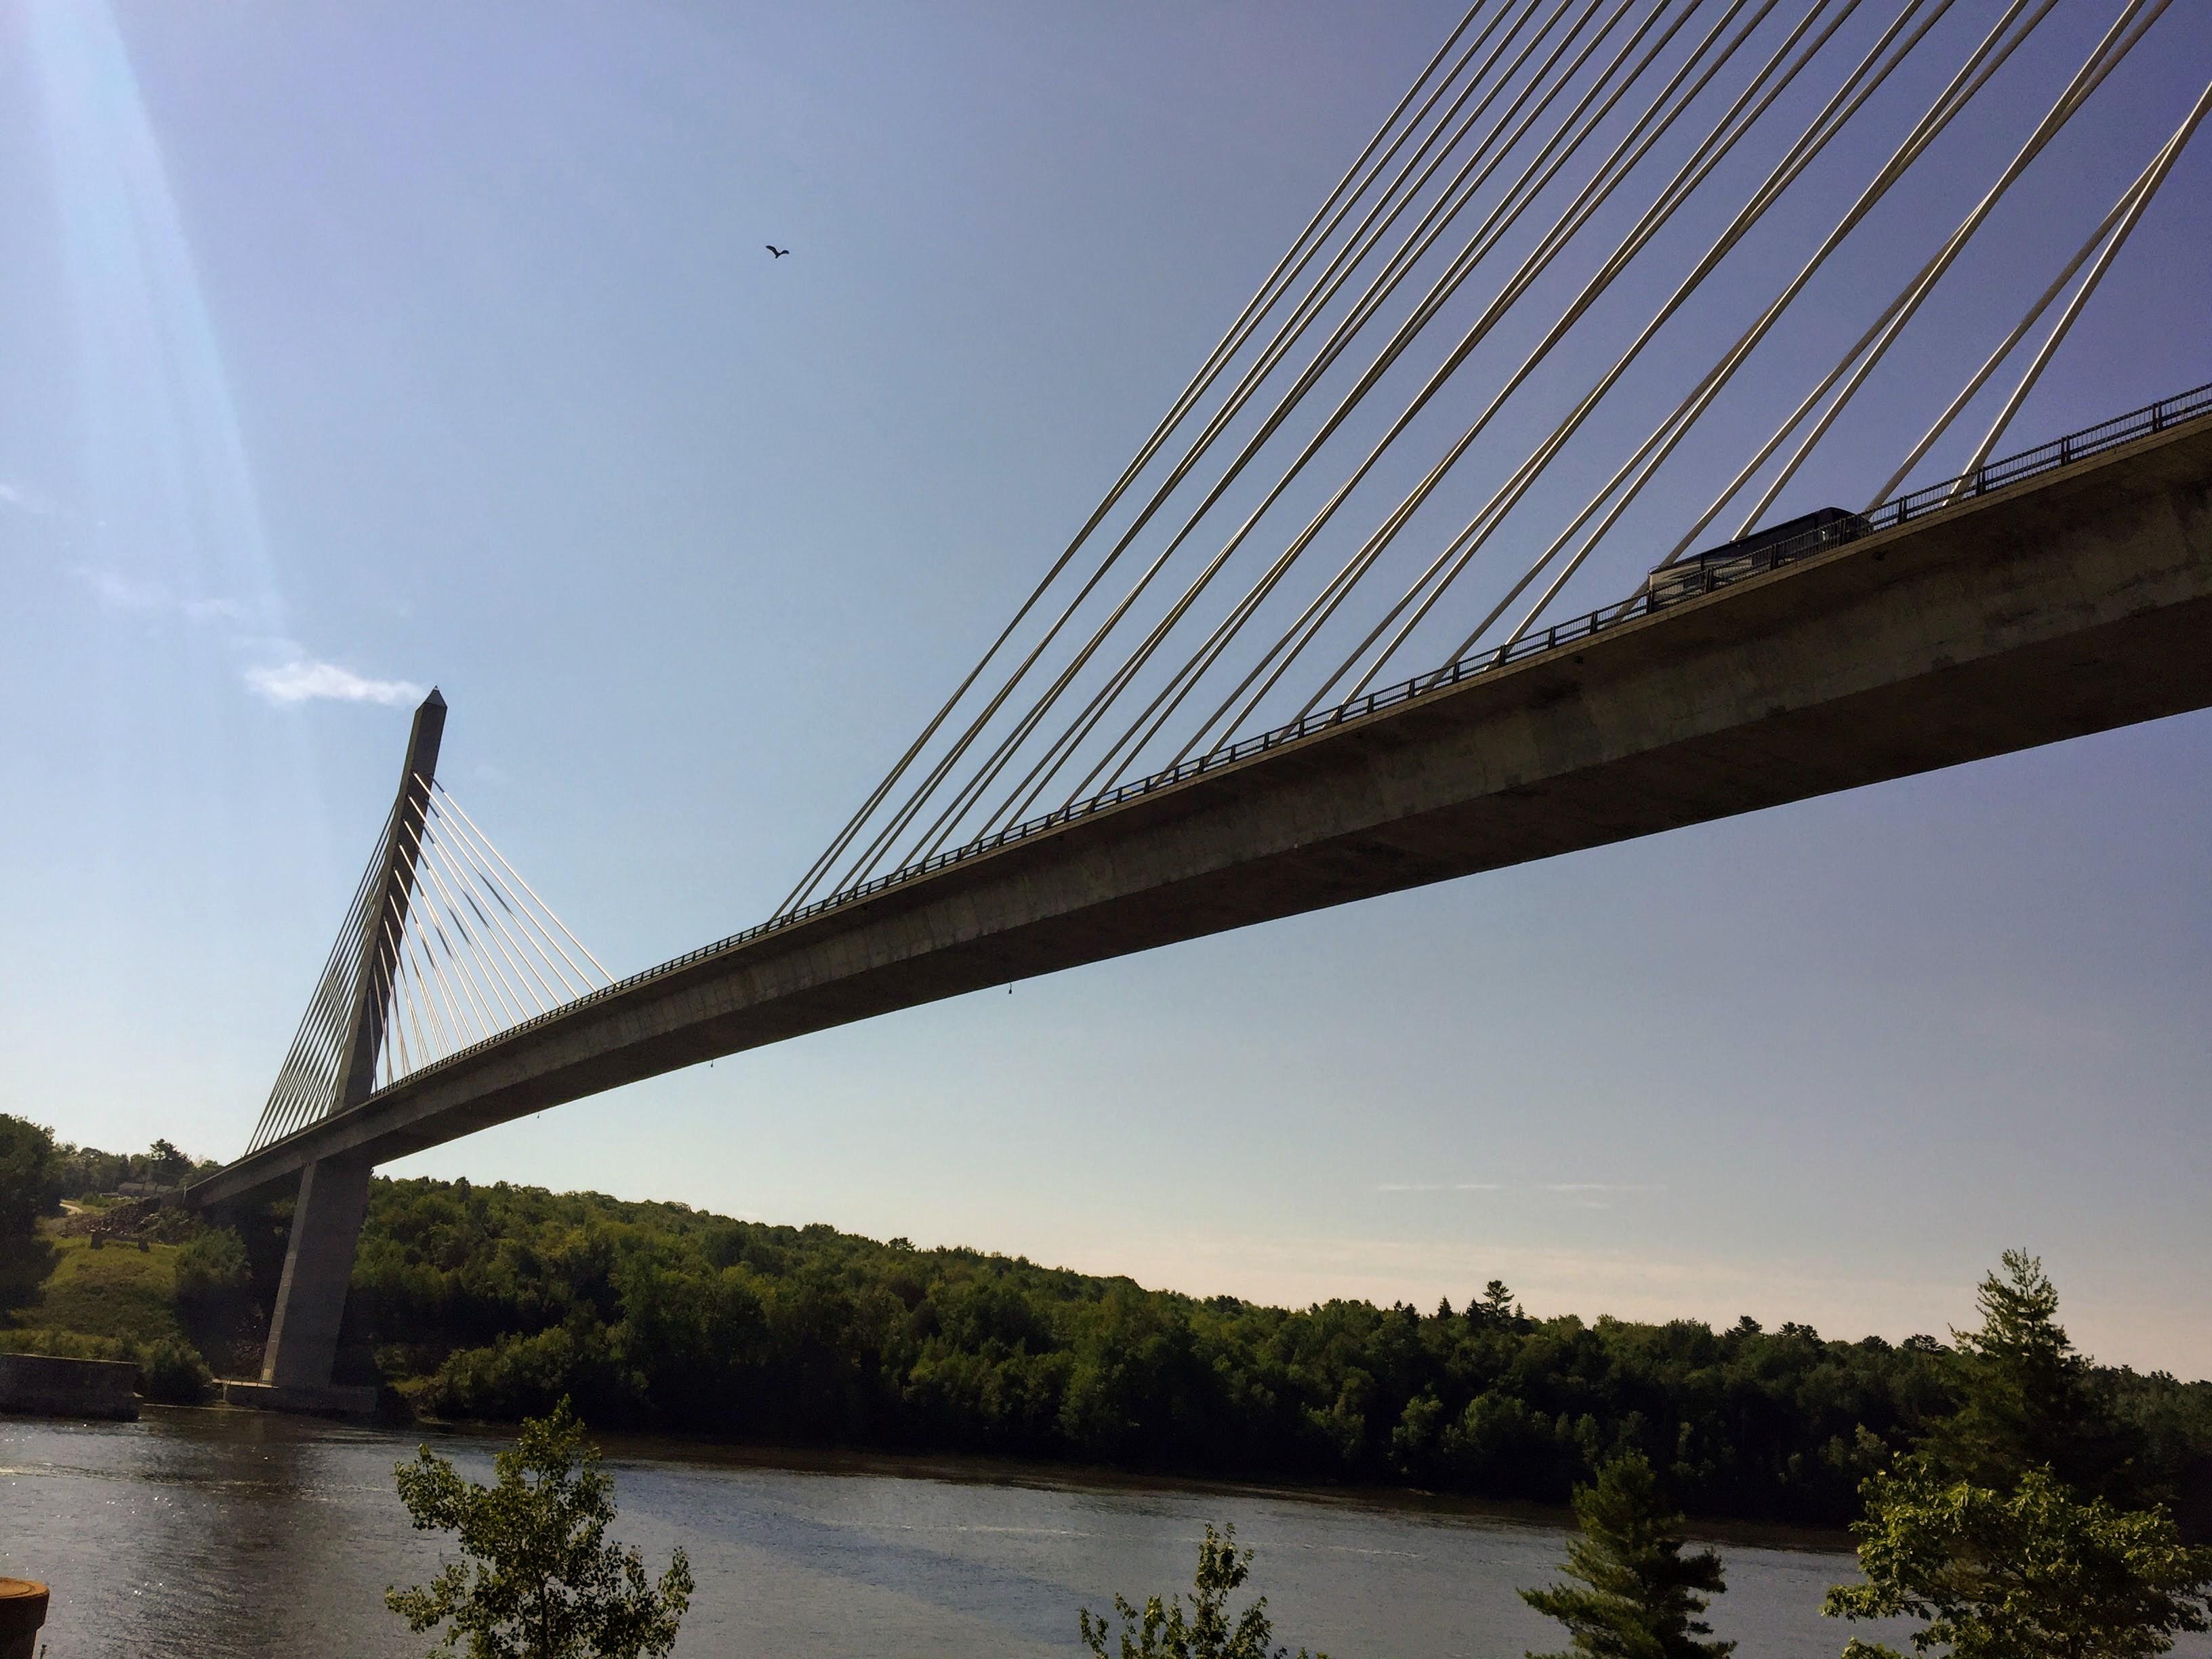 2017-07-22 Penobscot Narrows Bridge 01